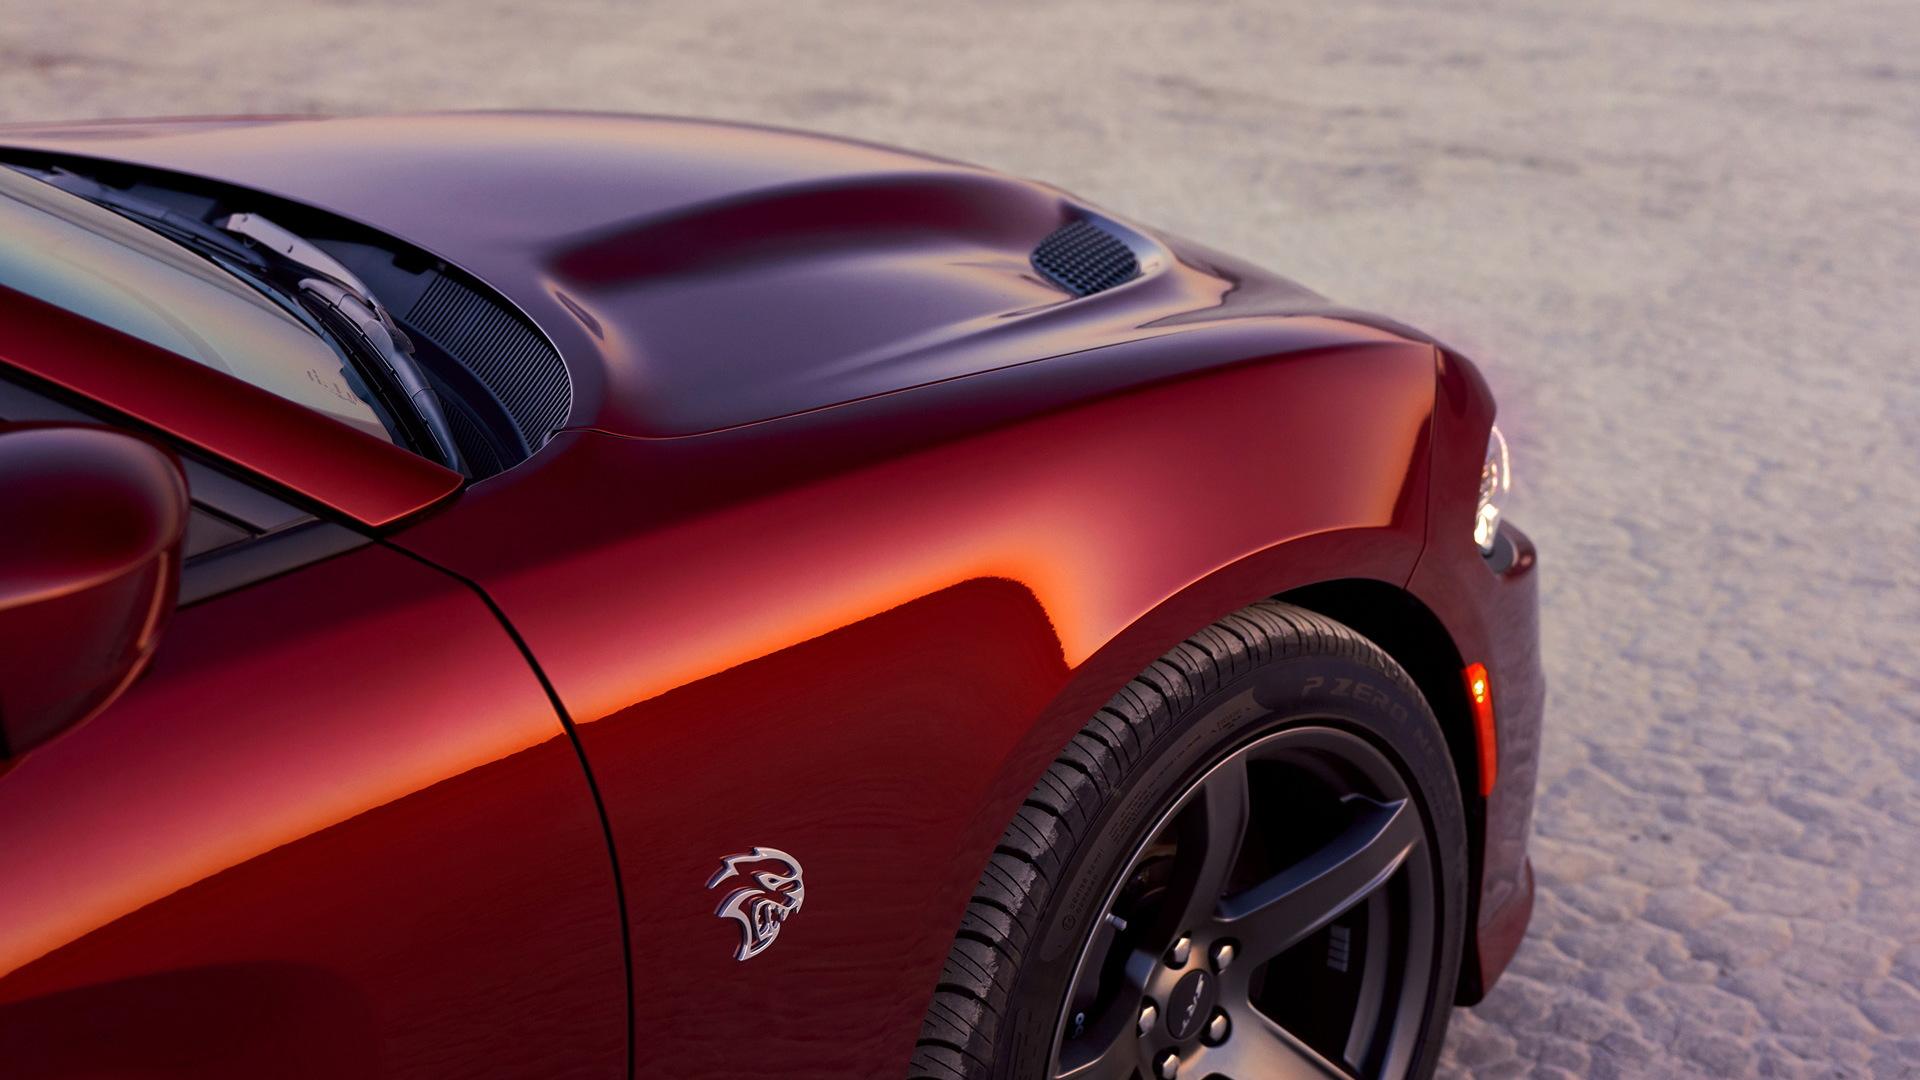 2019 Dodge Charger SRT Hellcat gets revised look, Demon tech